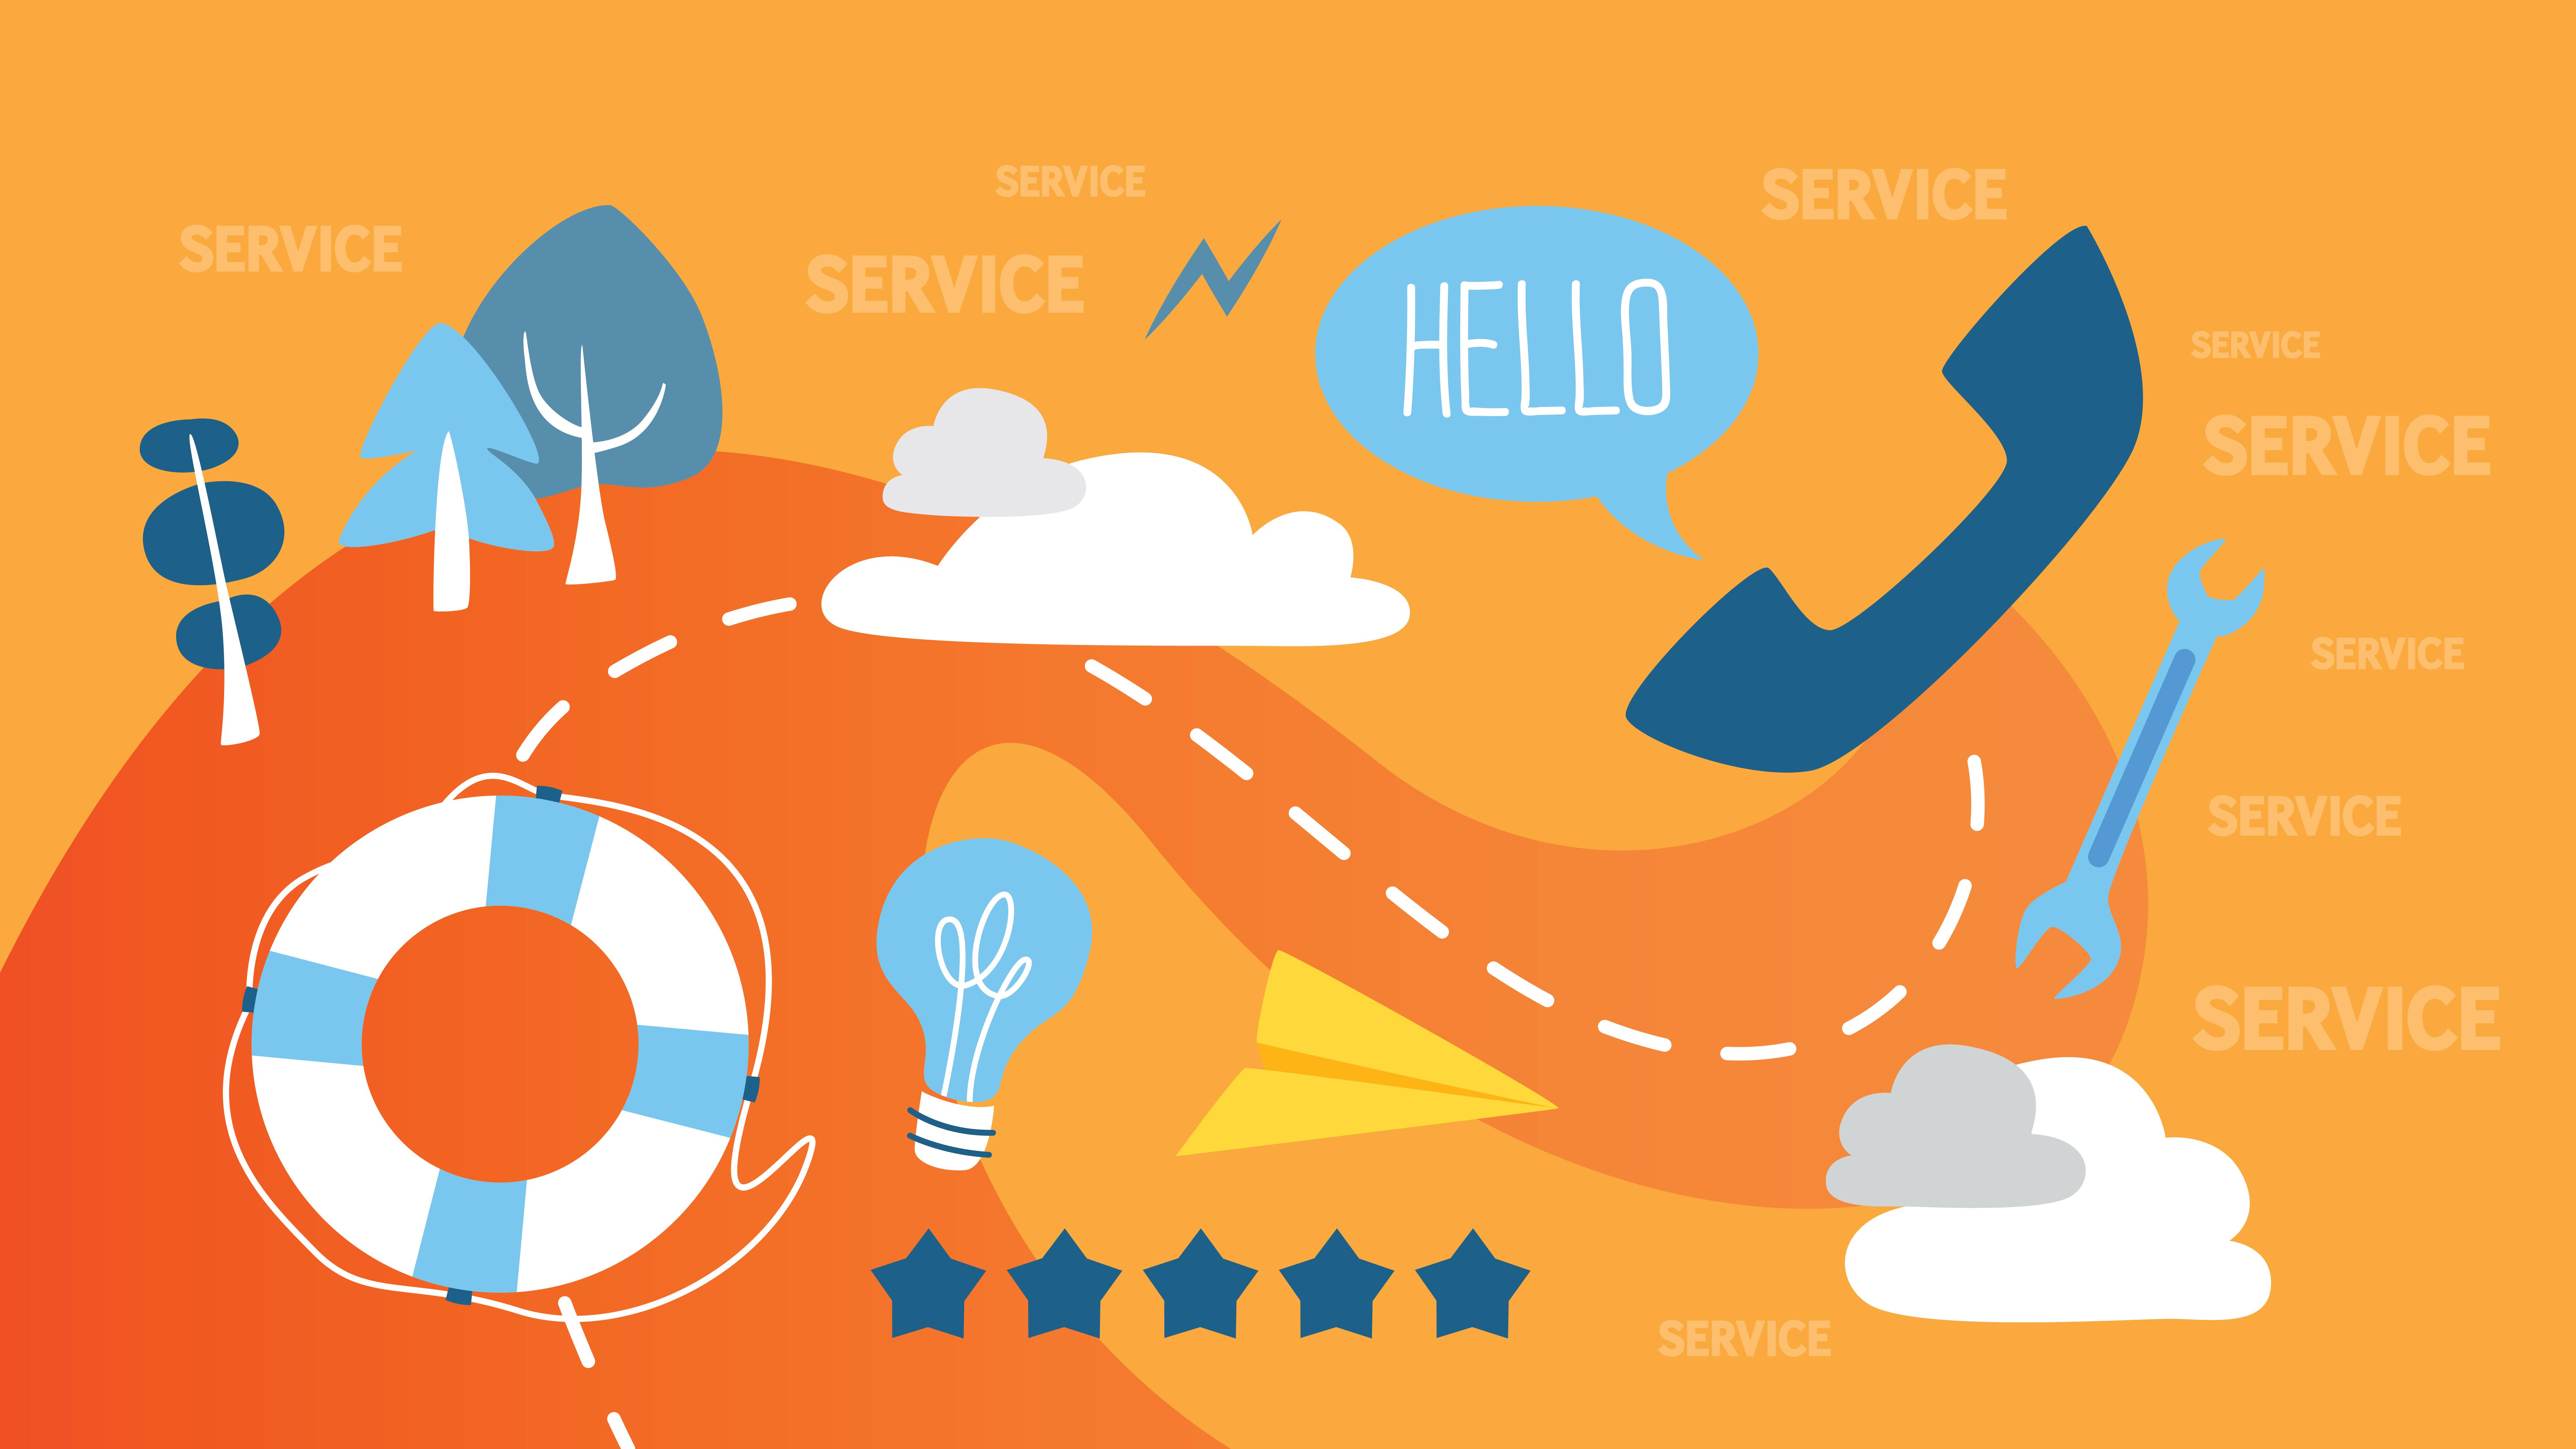 Customer service abstract illustration-1